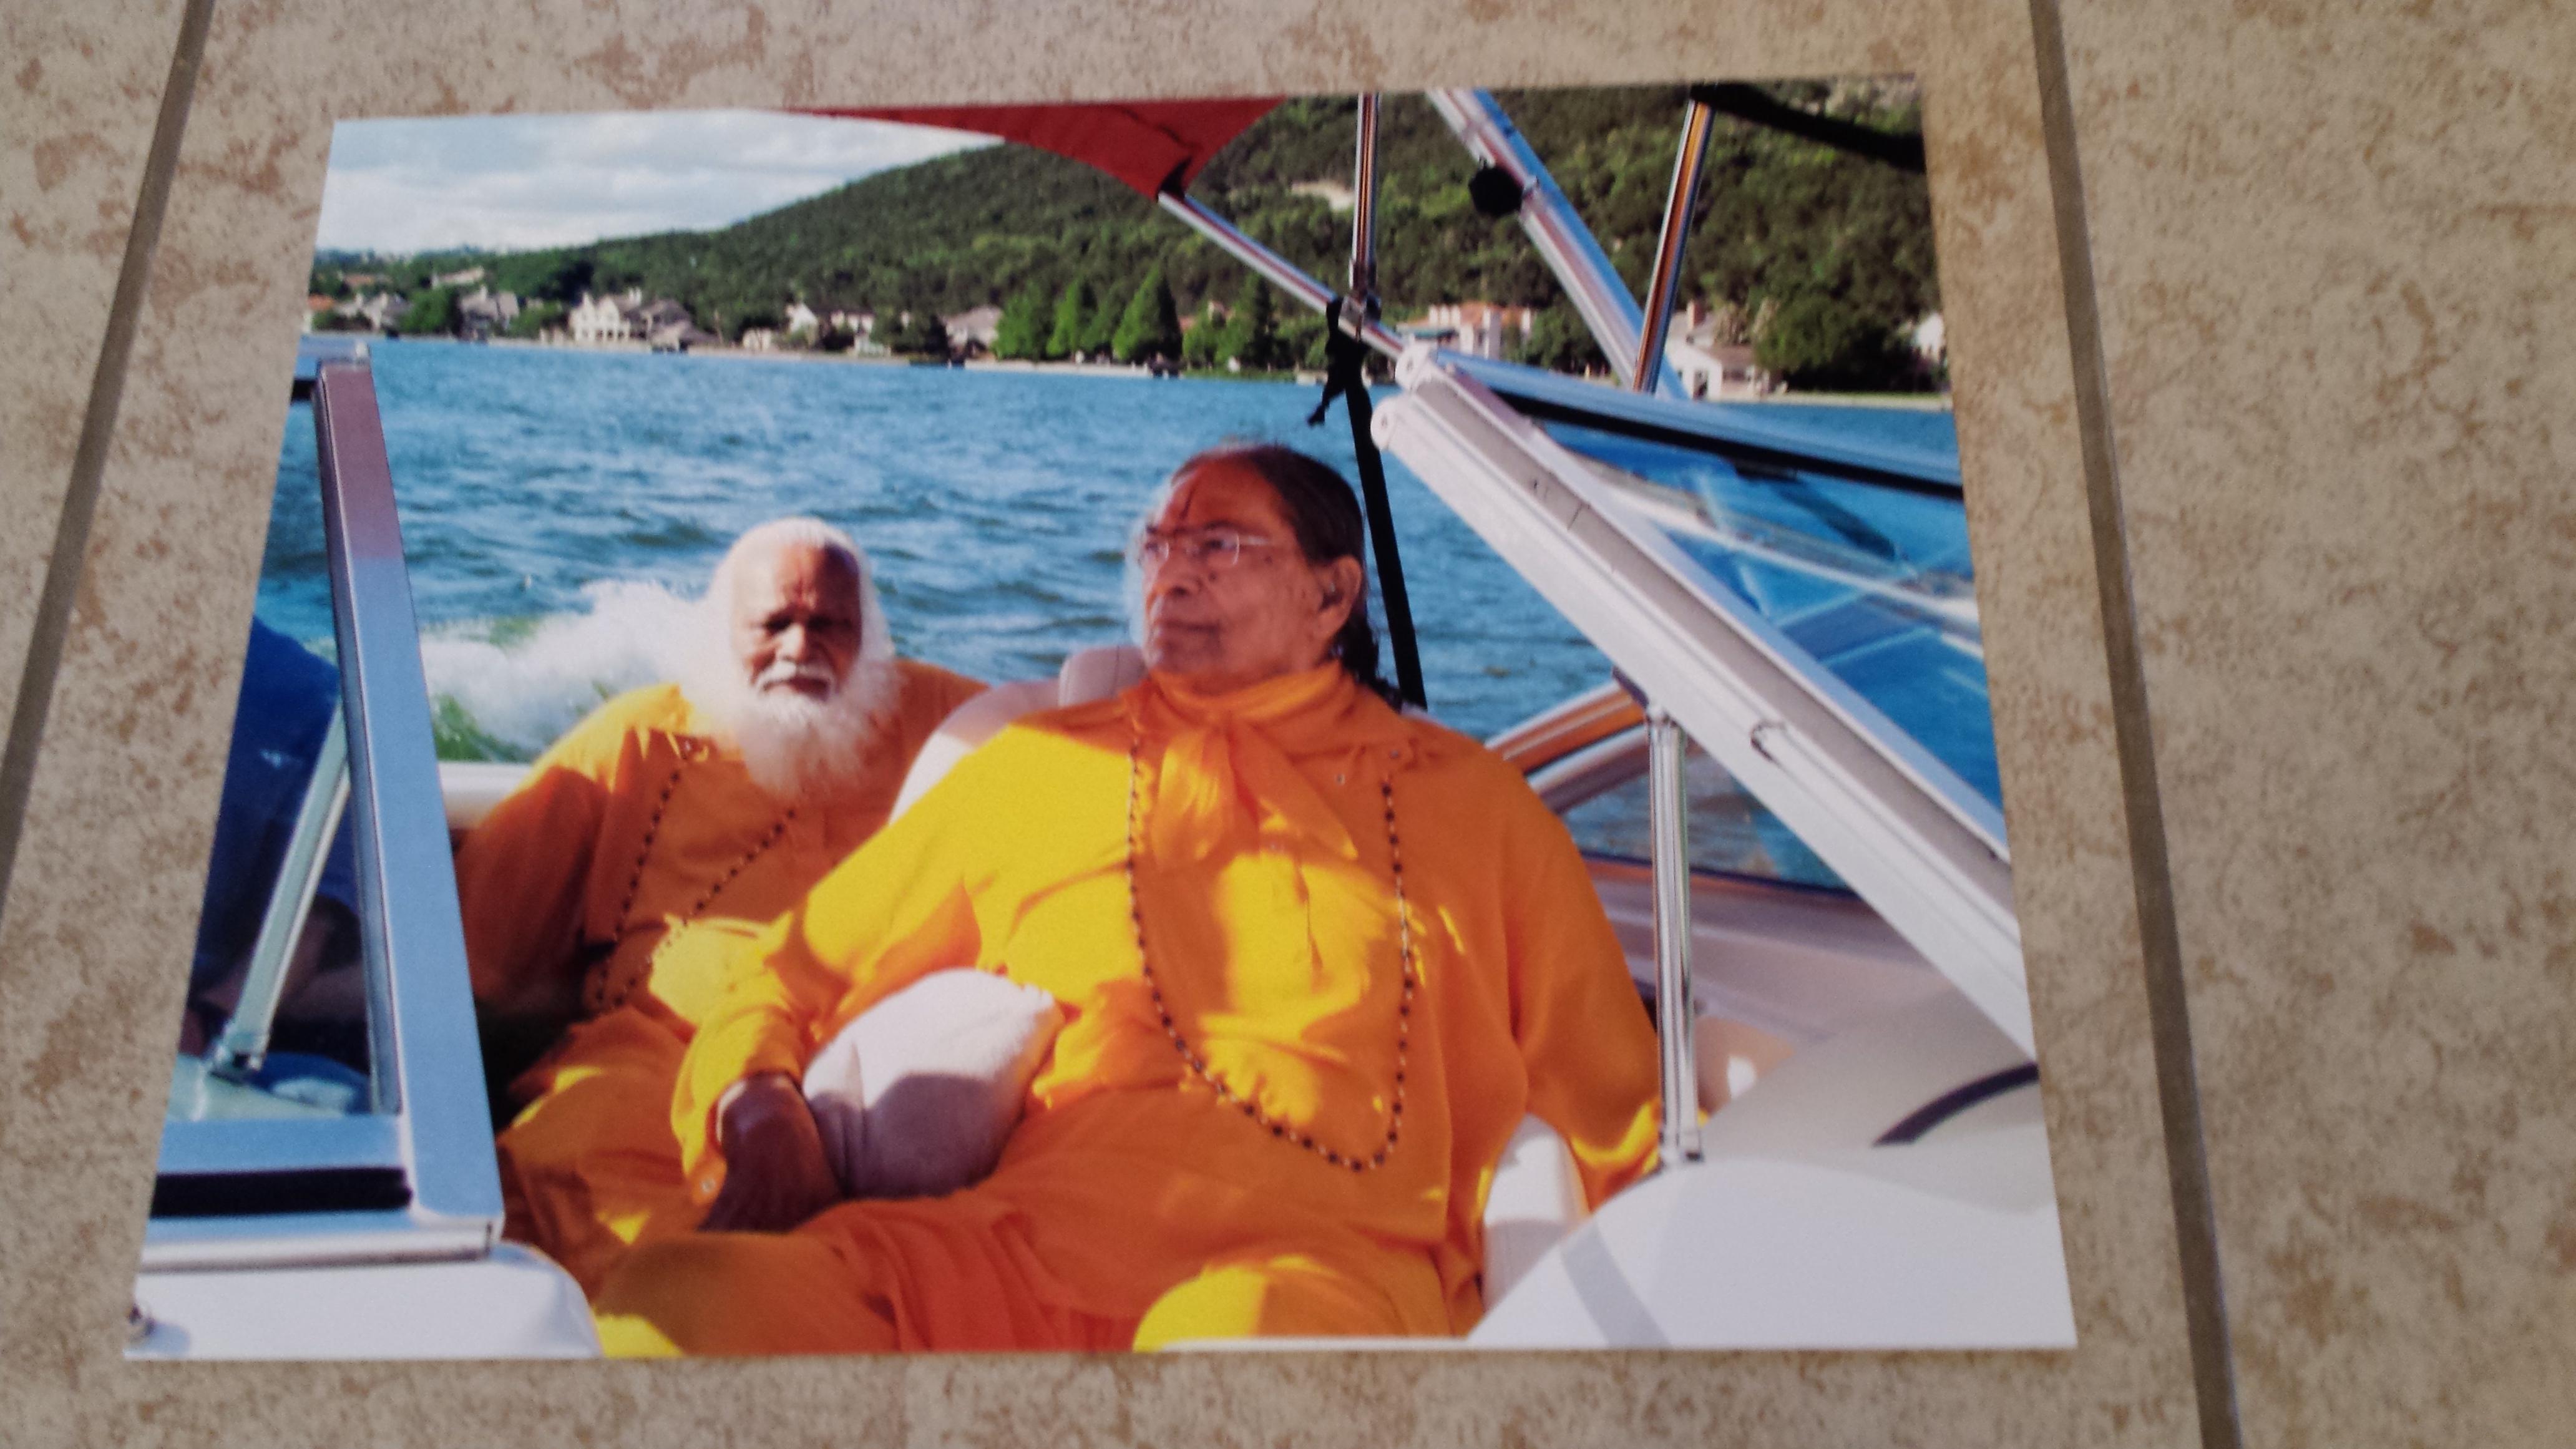 Guru boating buddies